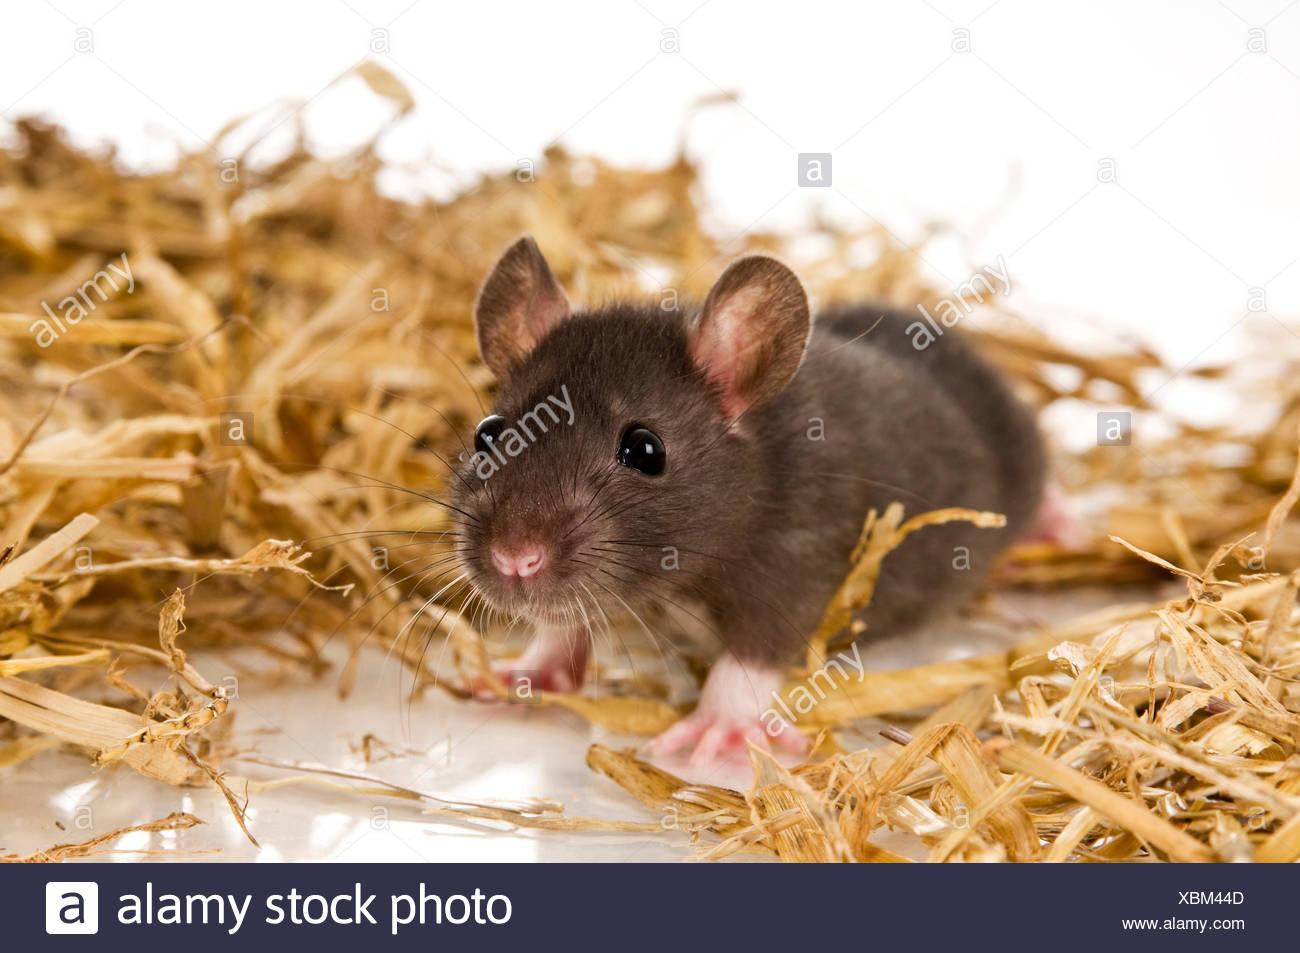 Ausgefallene Ratte Haustier Ratte Jugendkriminalitat Im Stroh